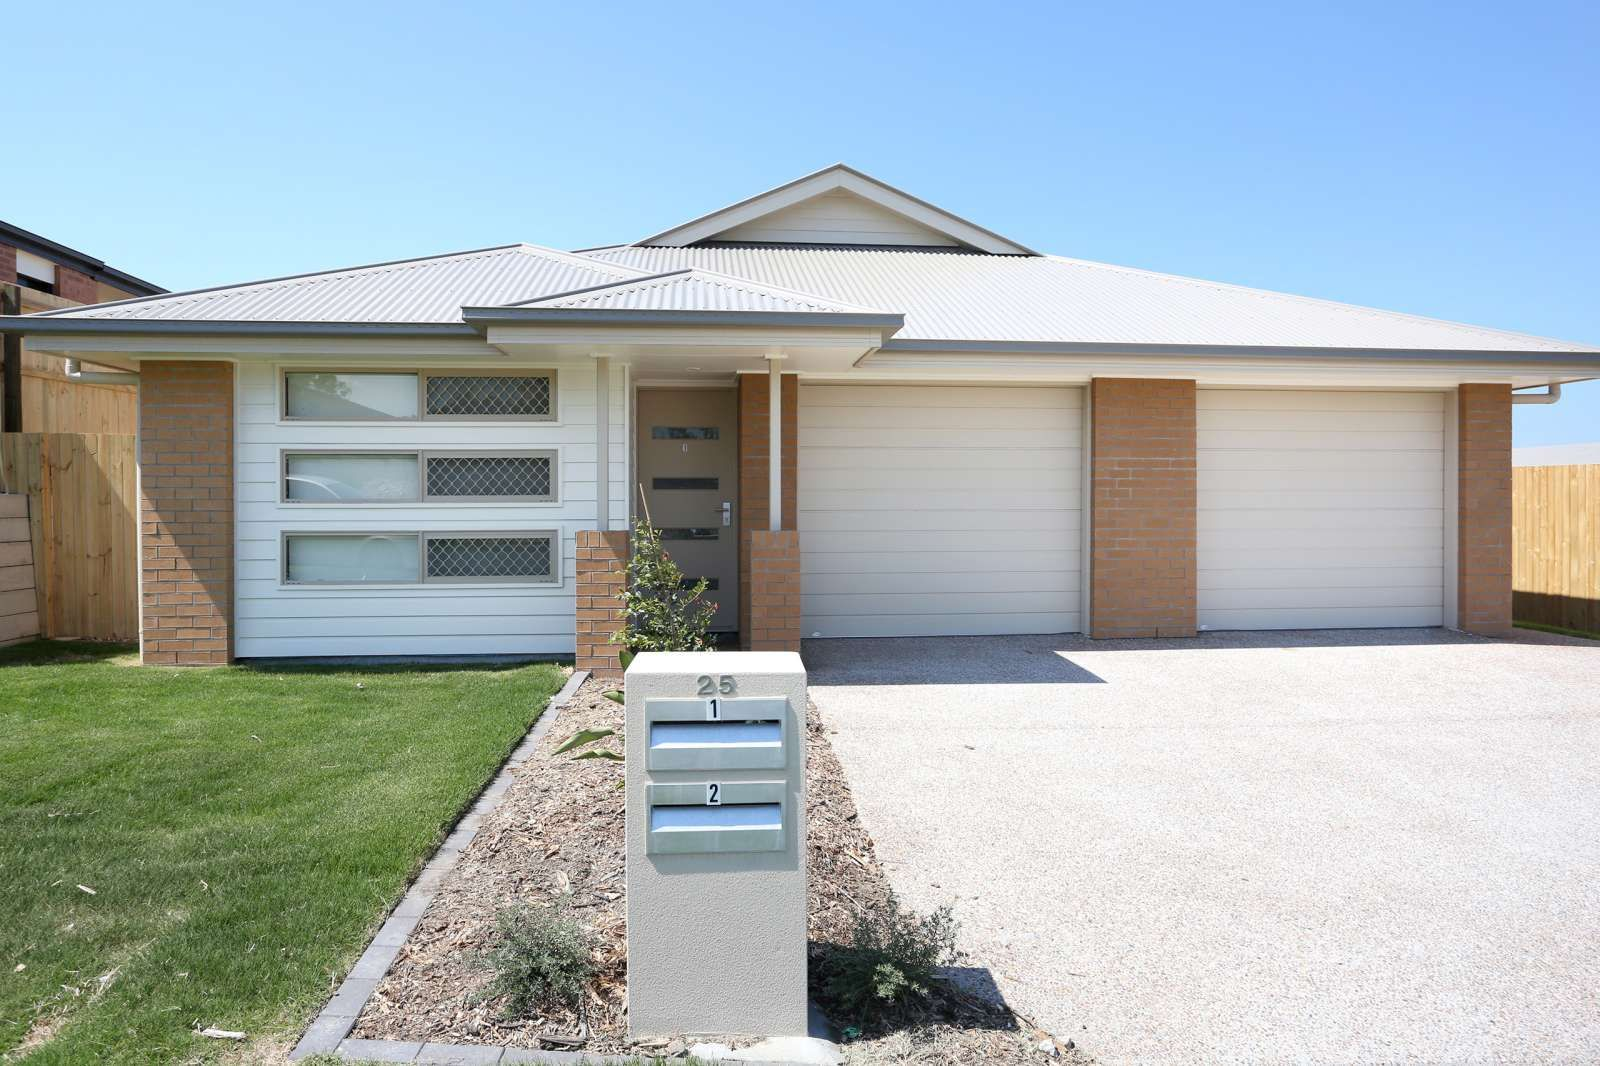 2/25 Kanimbla Street, Holmview QLD 4207, Image 0